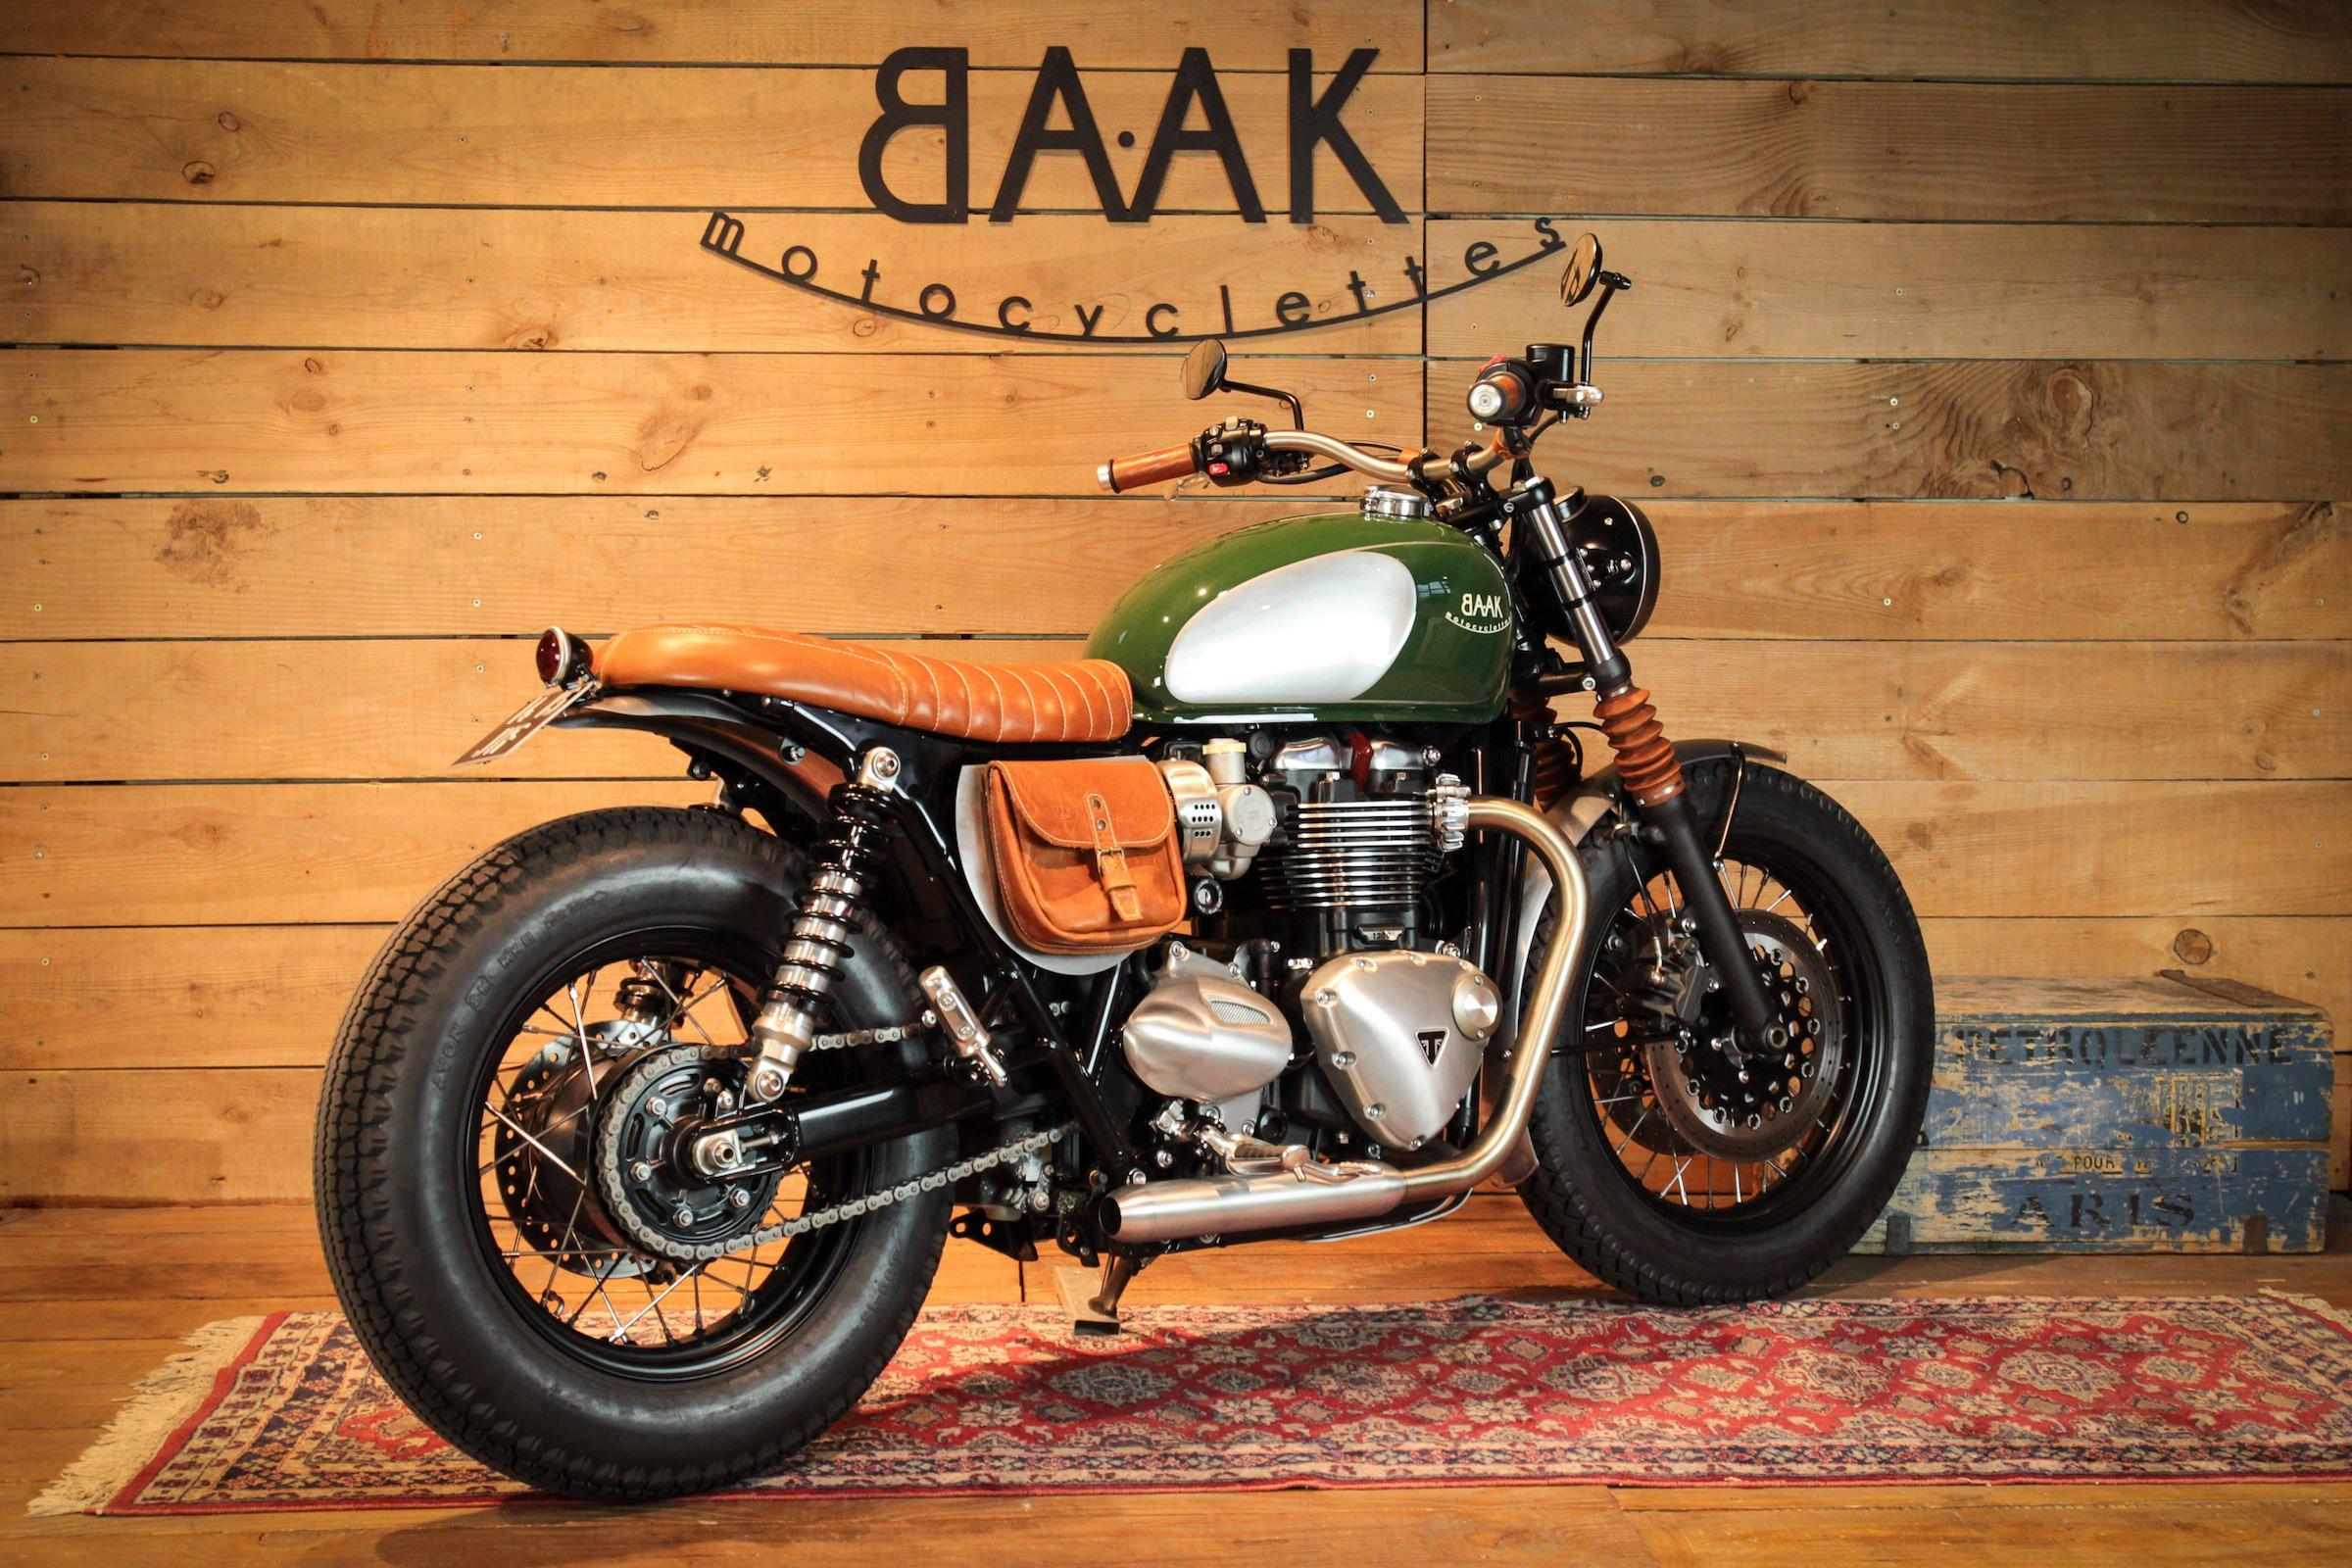 BAAK Motorcycles Custom Triumph Bonneville T120